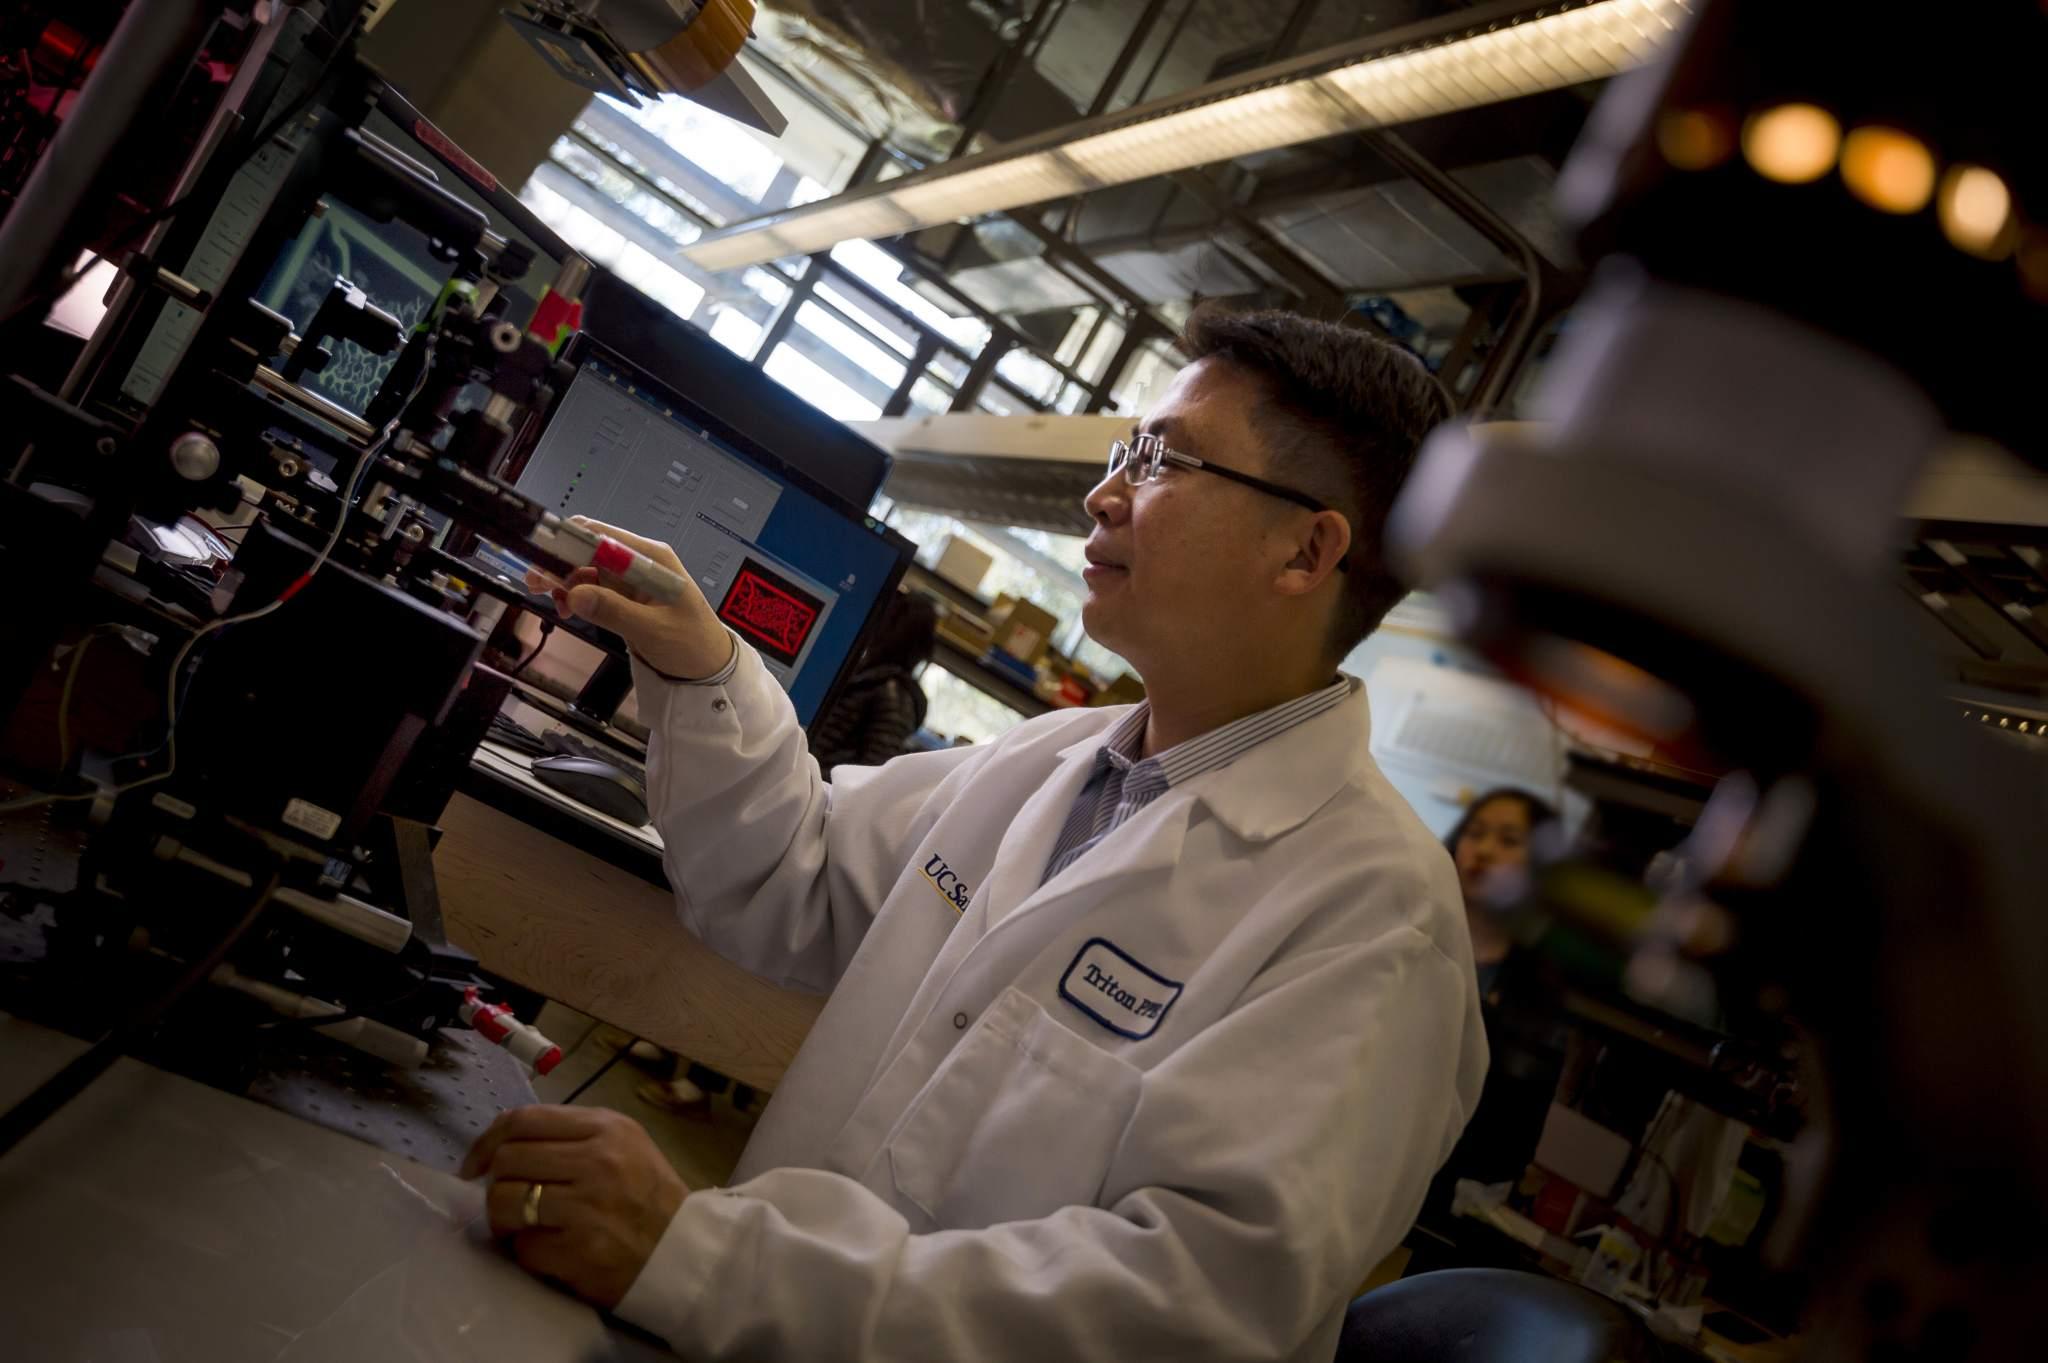 Nanoengineering professor Shaochen Chen. Photo by Erik Jepsen/UC San Diego Publications.